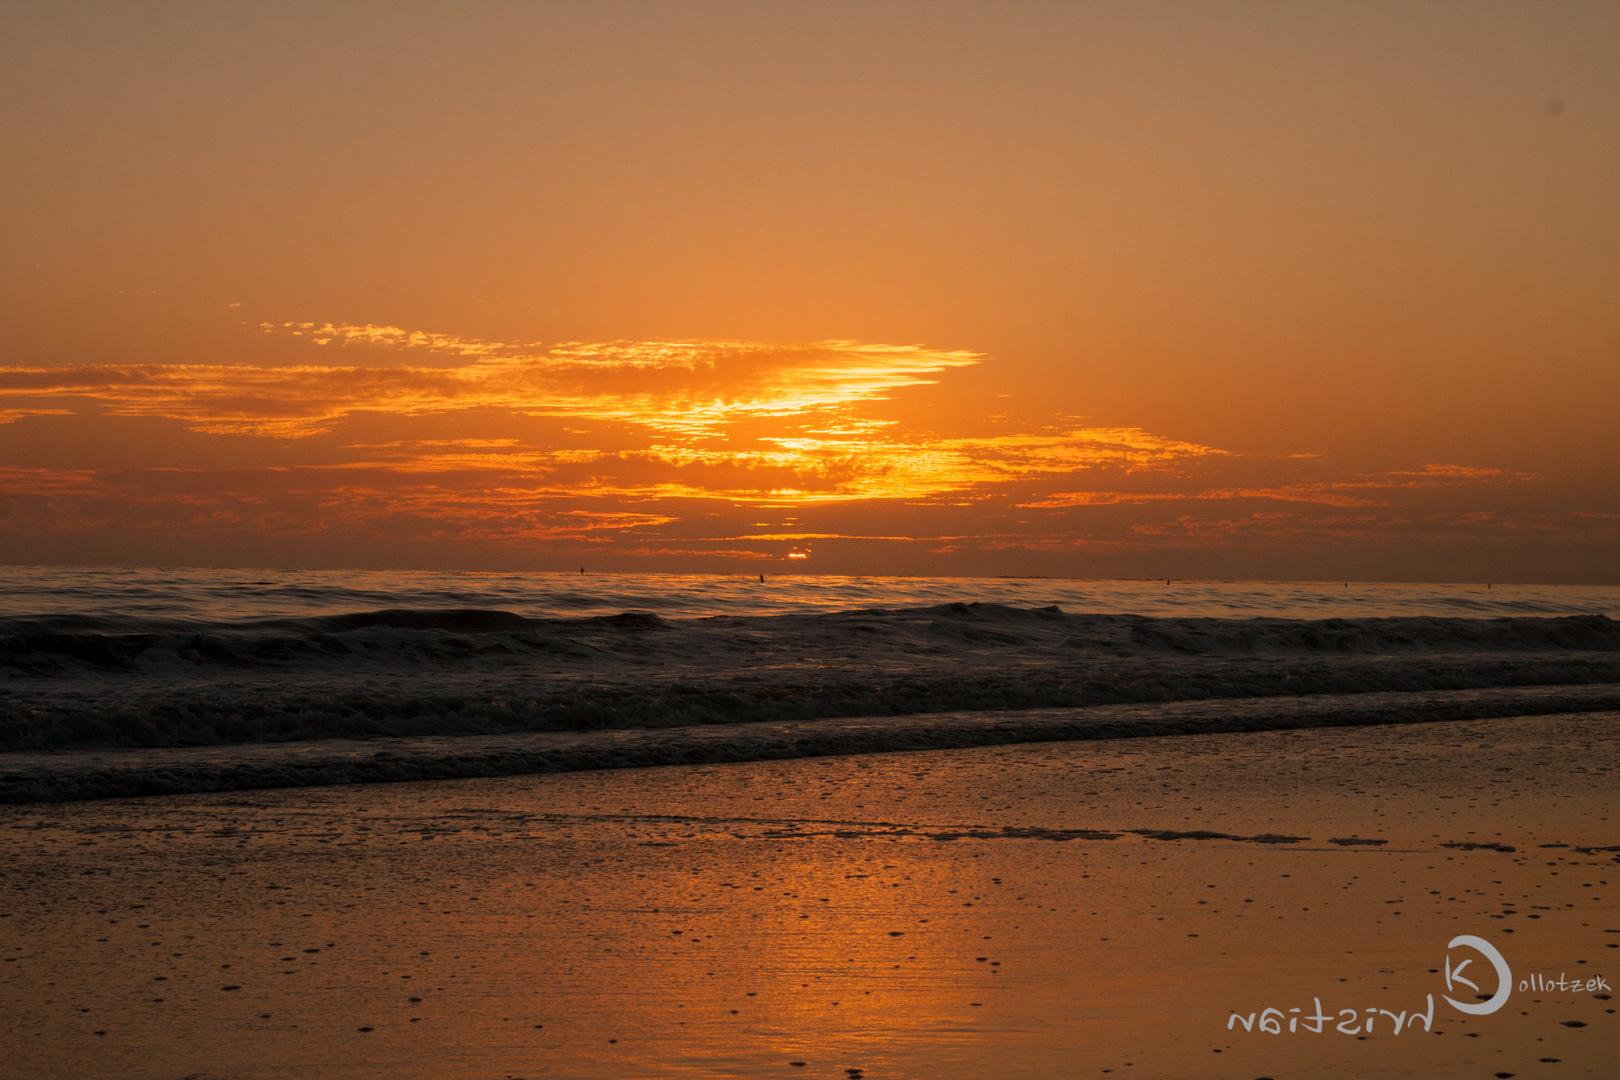 Sunset in Santa Barbara